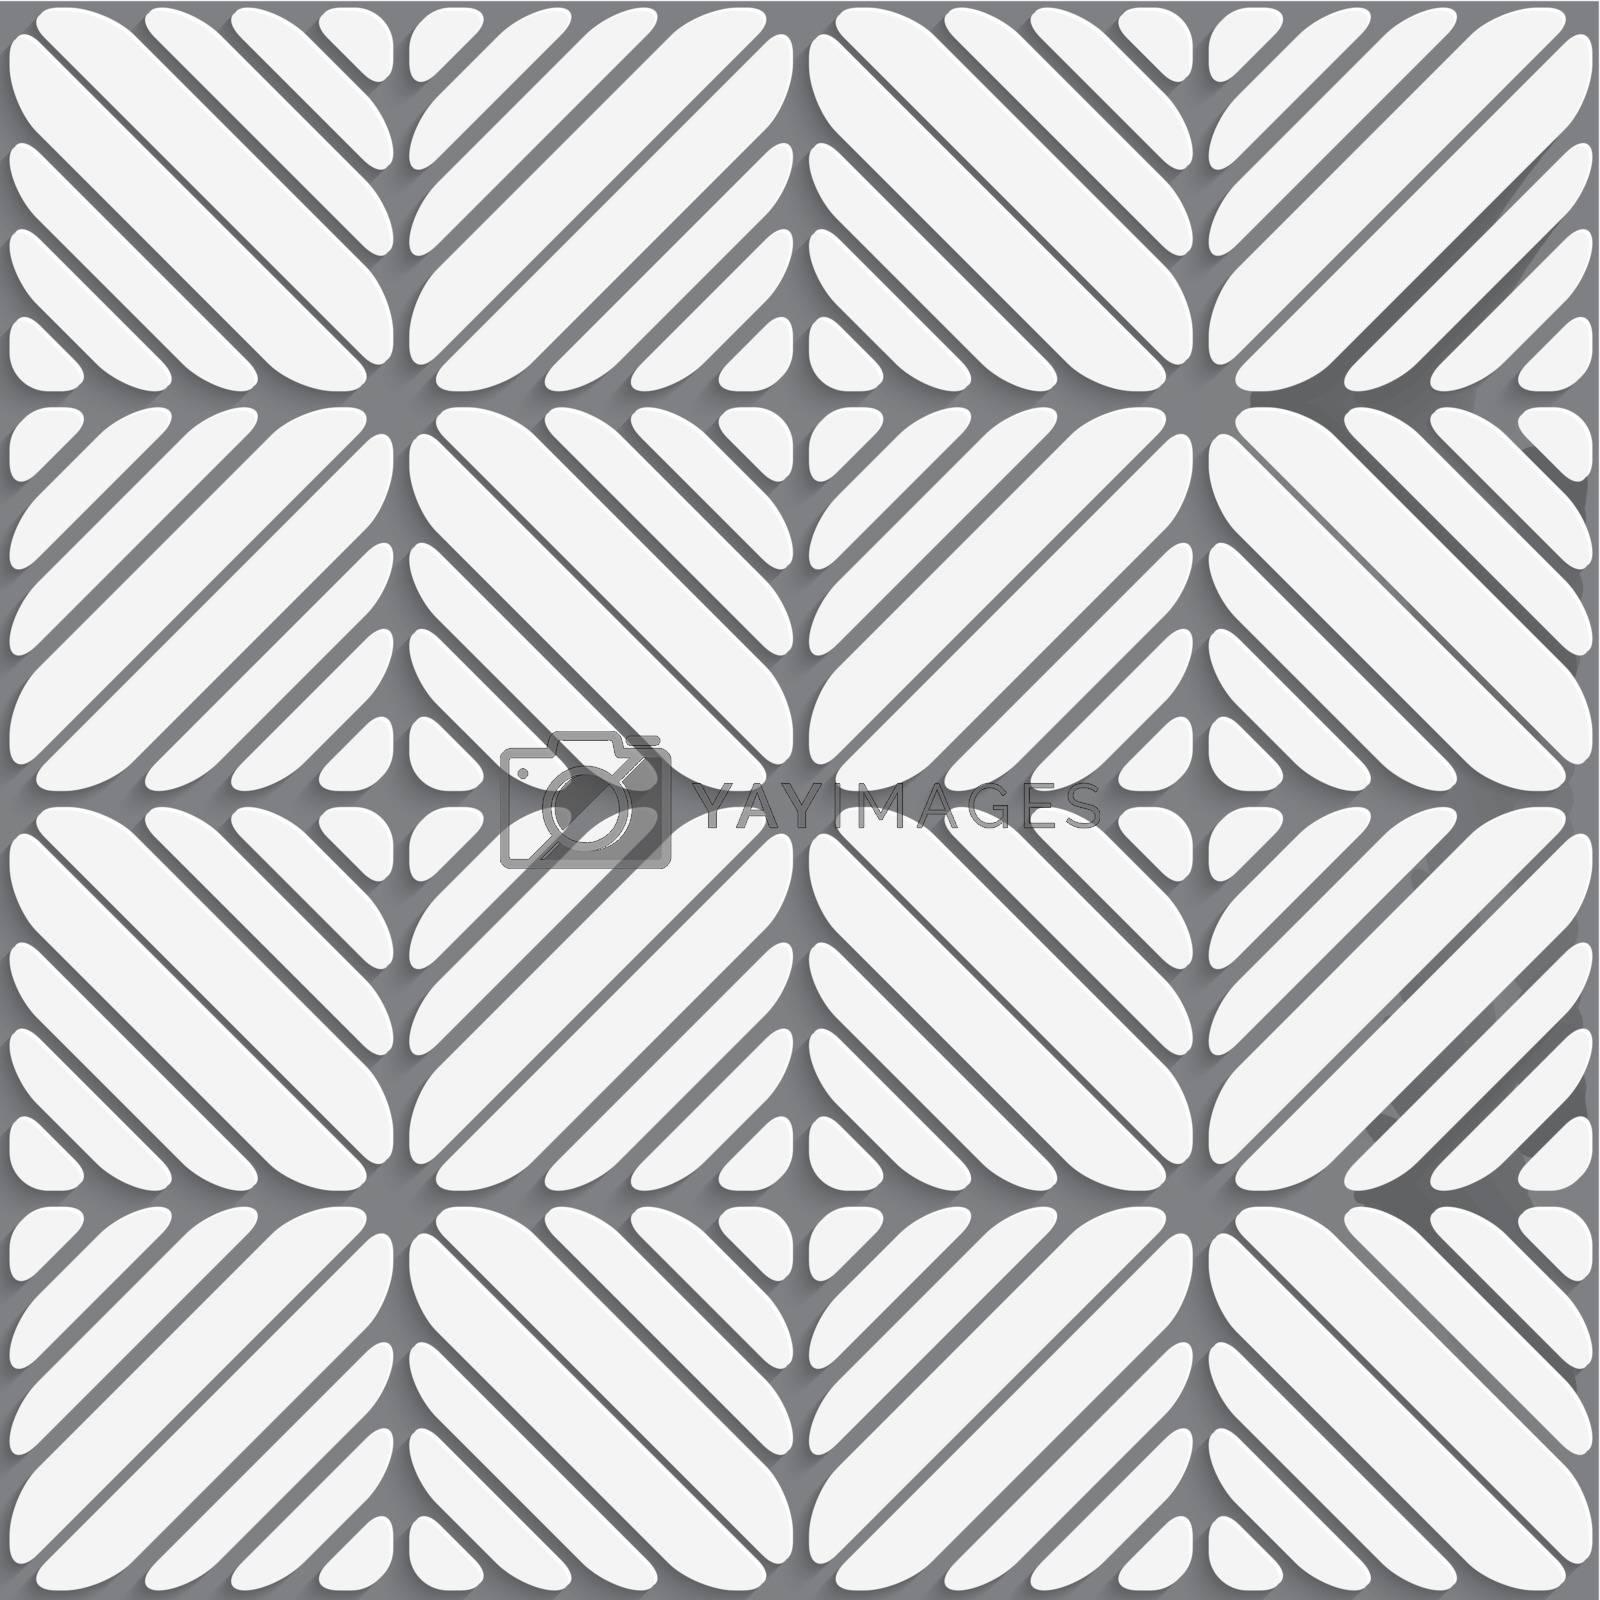 White on gray seamless ornament by Zebra-Finch